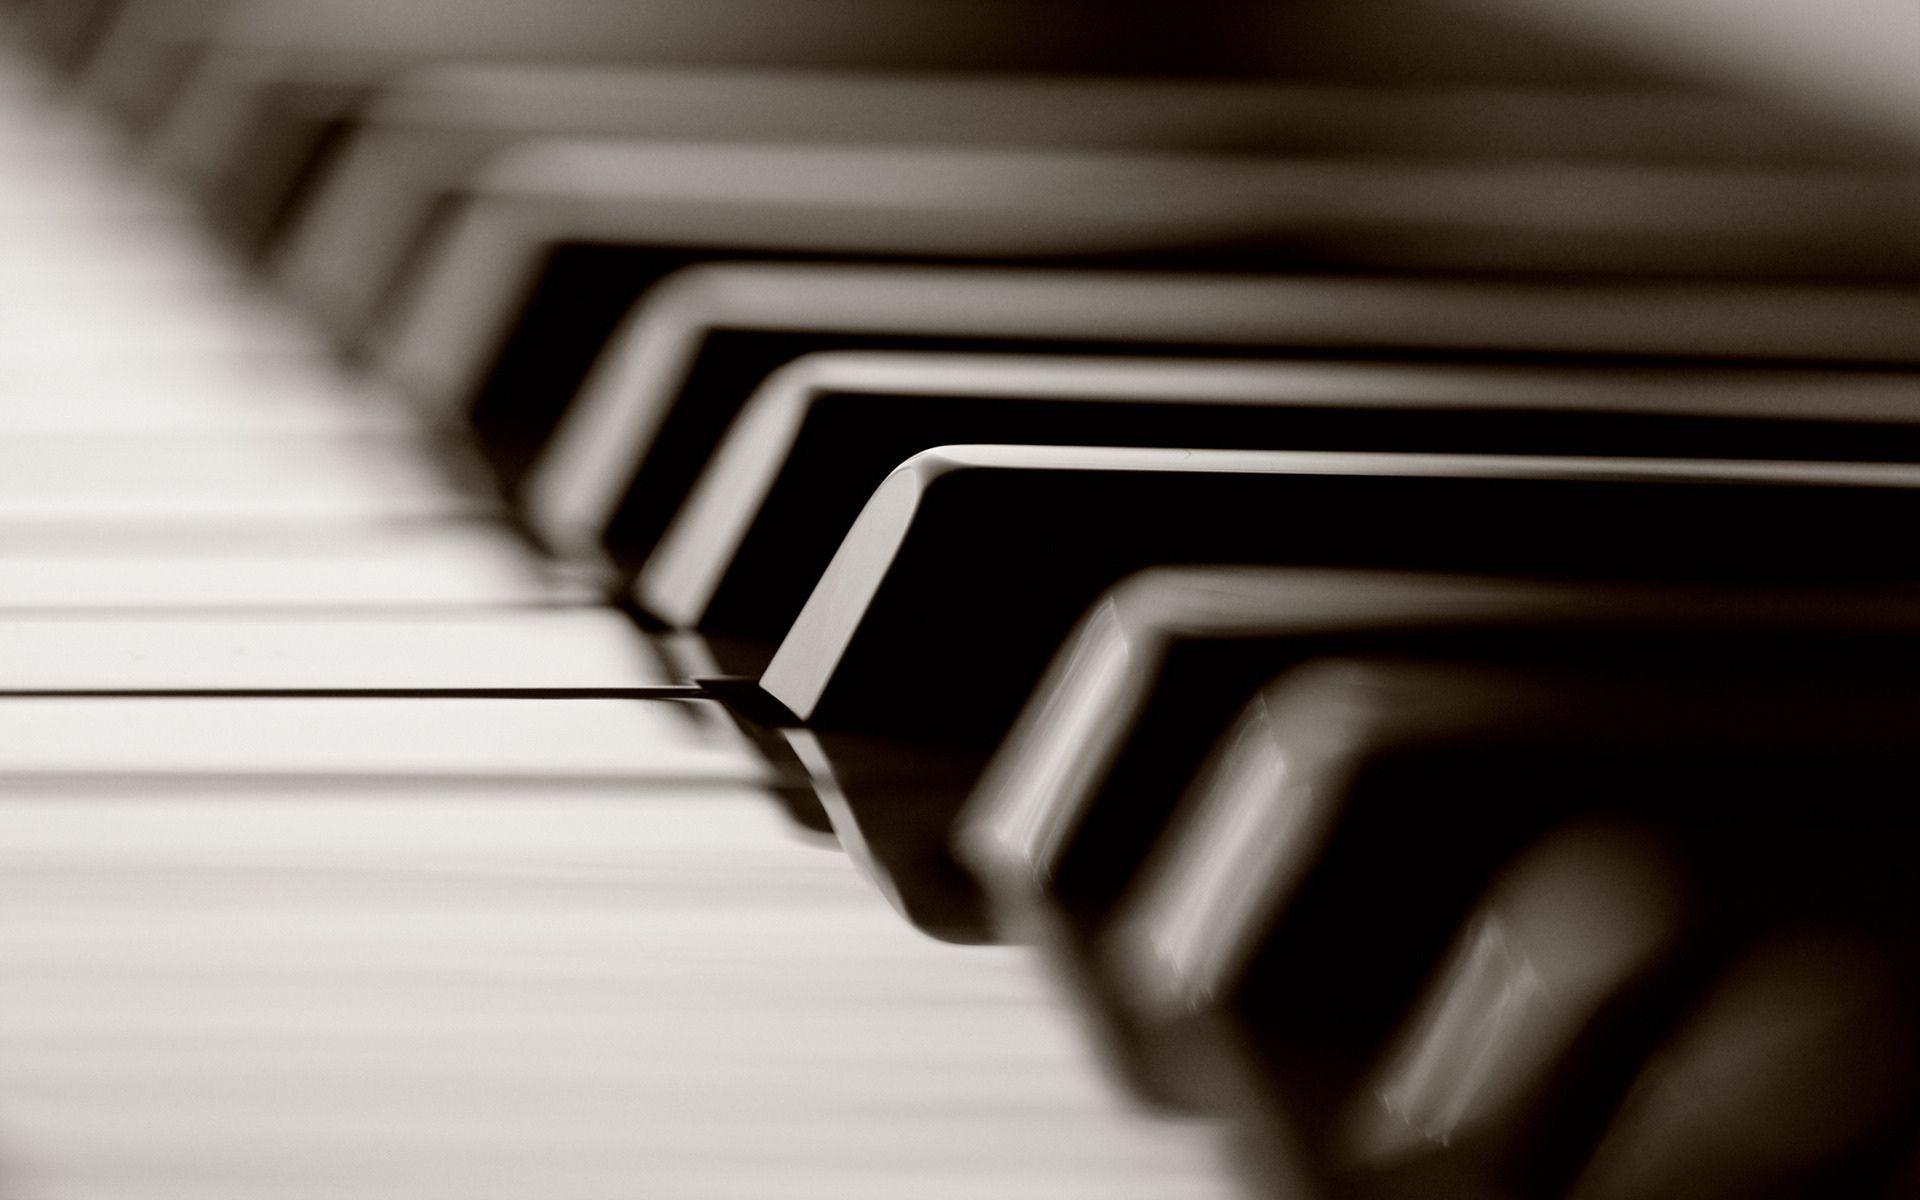 Piano Computer Wallpapers, Desktop Backgrounds 1680x1050 Id: 47766